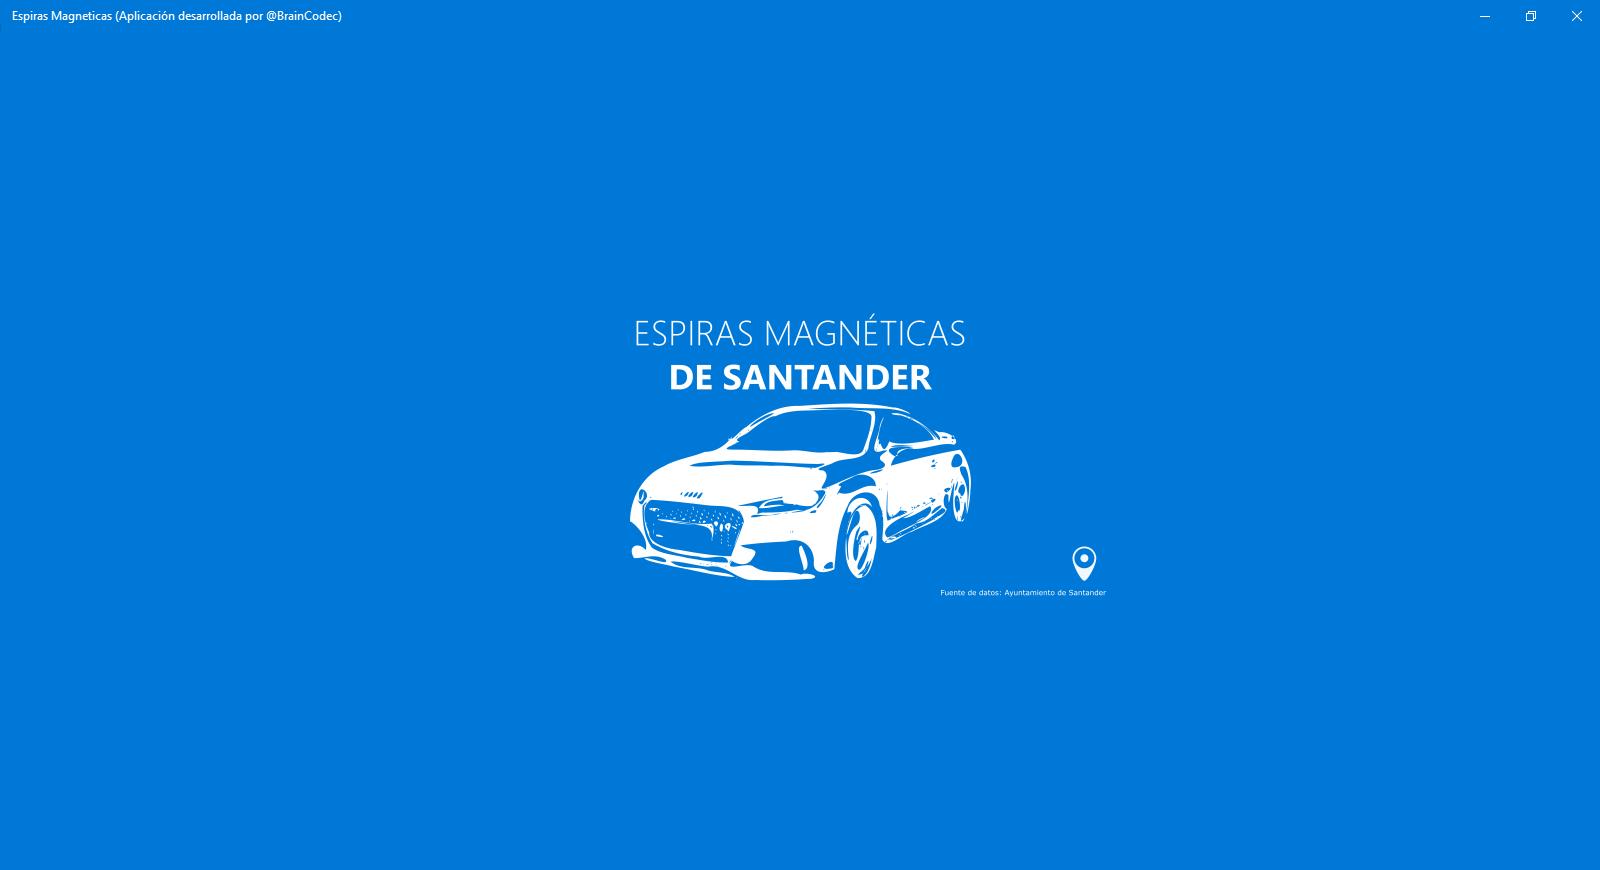 http://datos.santander.es/wp-content/uploads/2020/05/EspirasMagneticas_BrainCodec_Captura_3.png